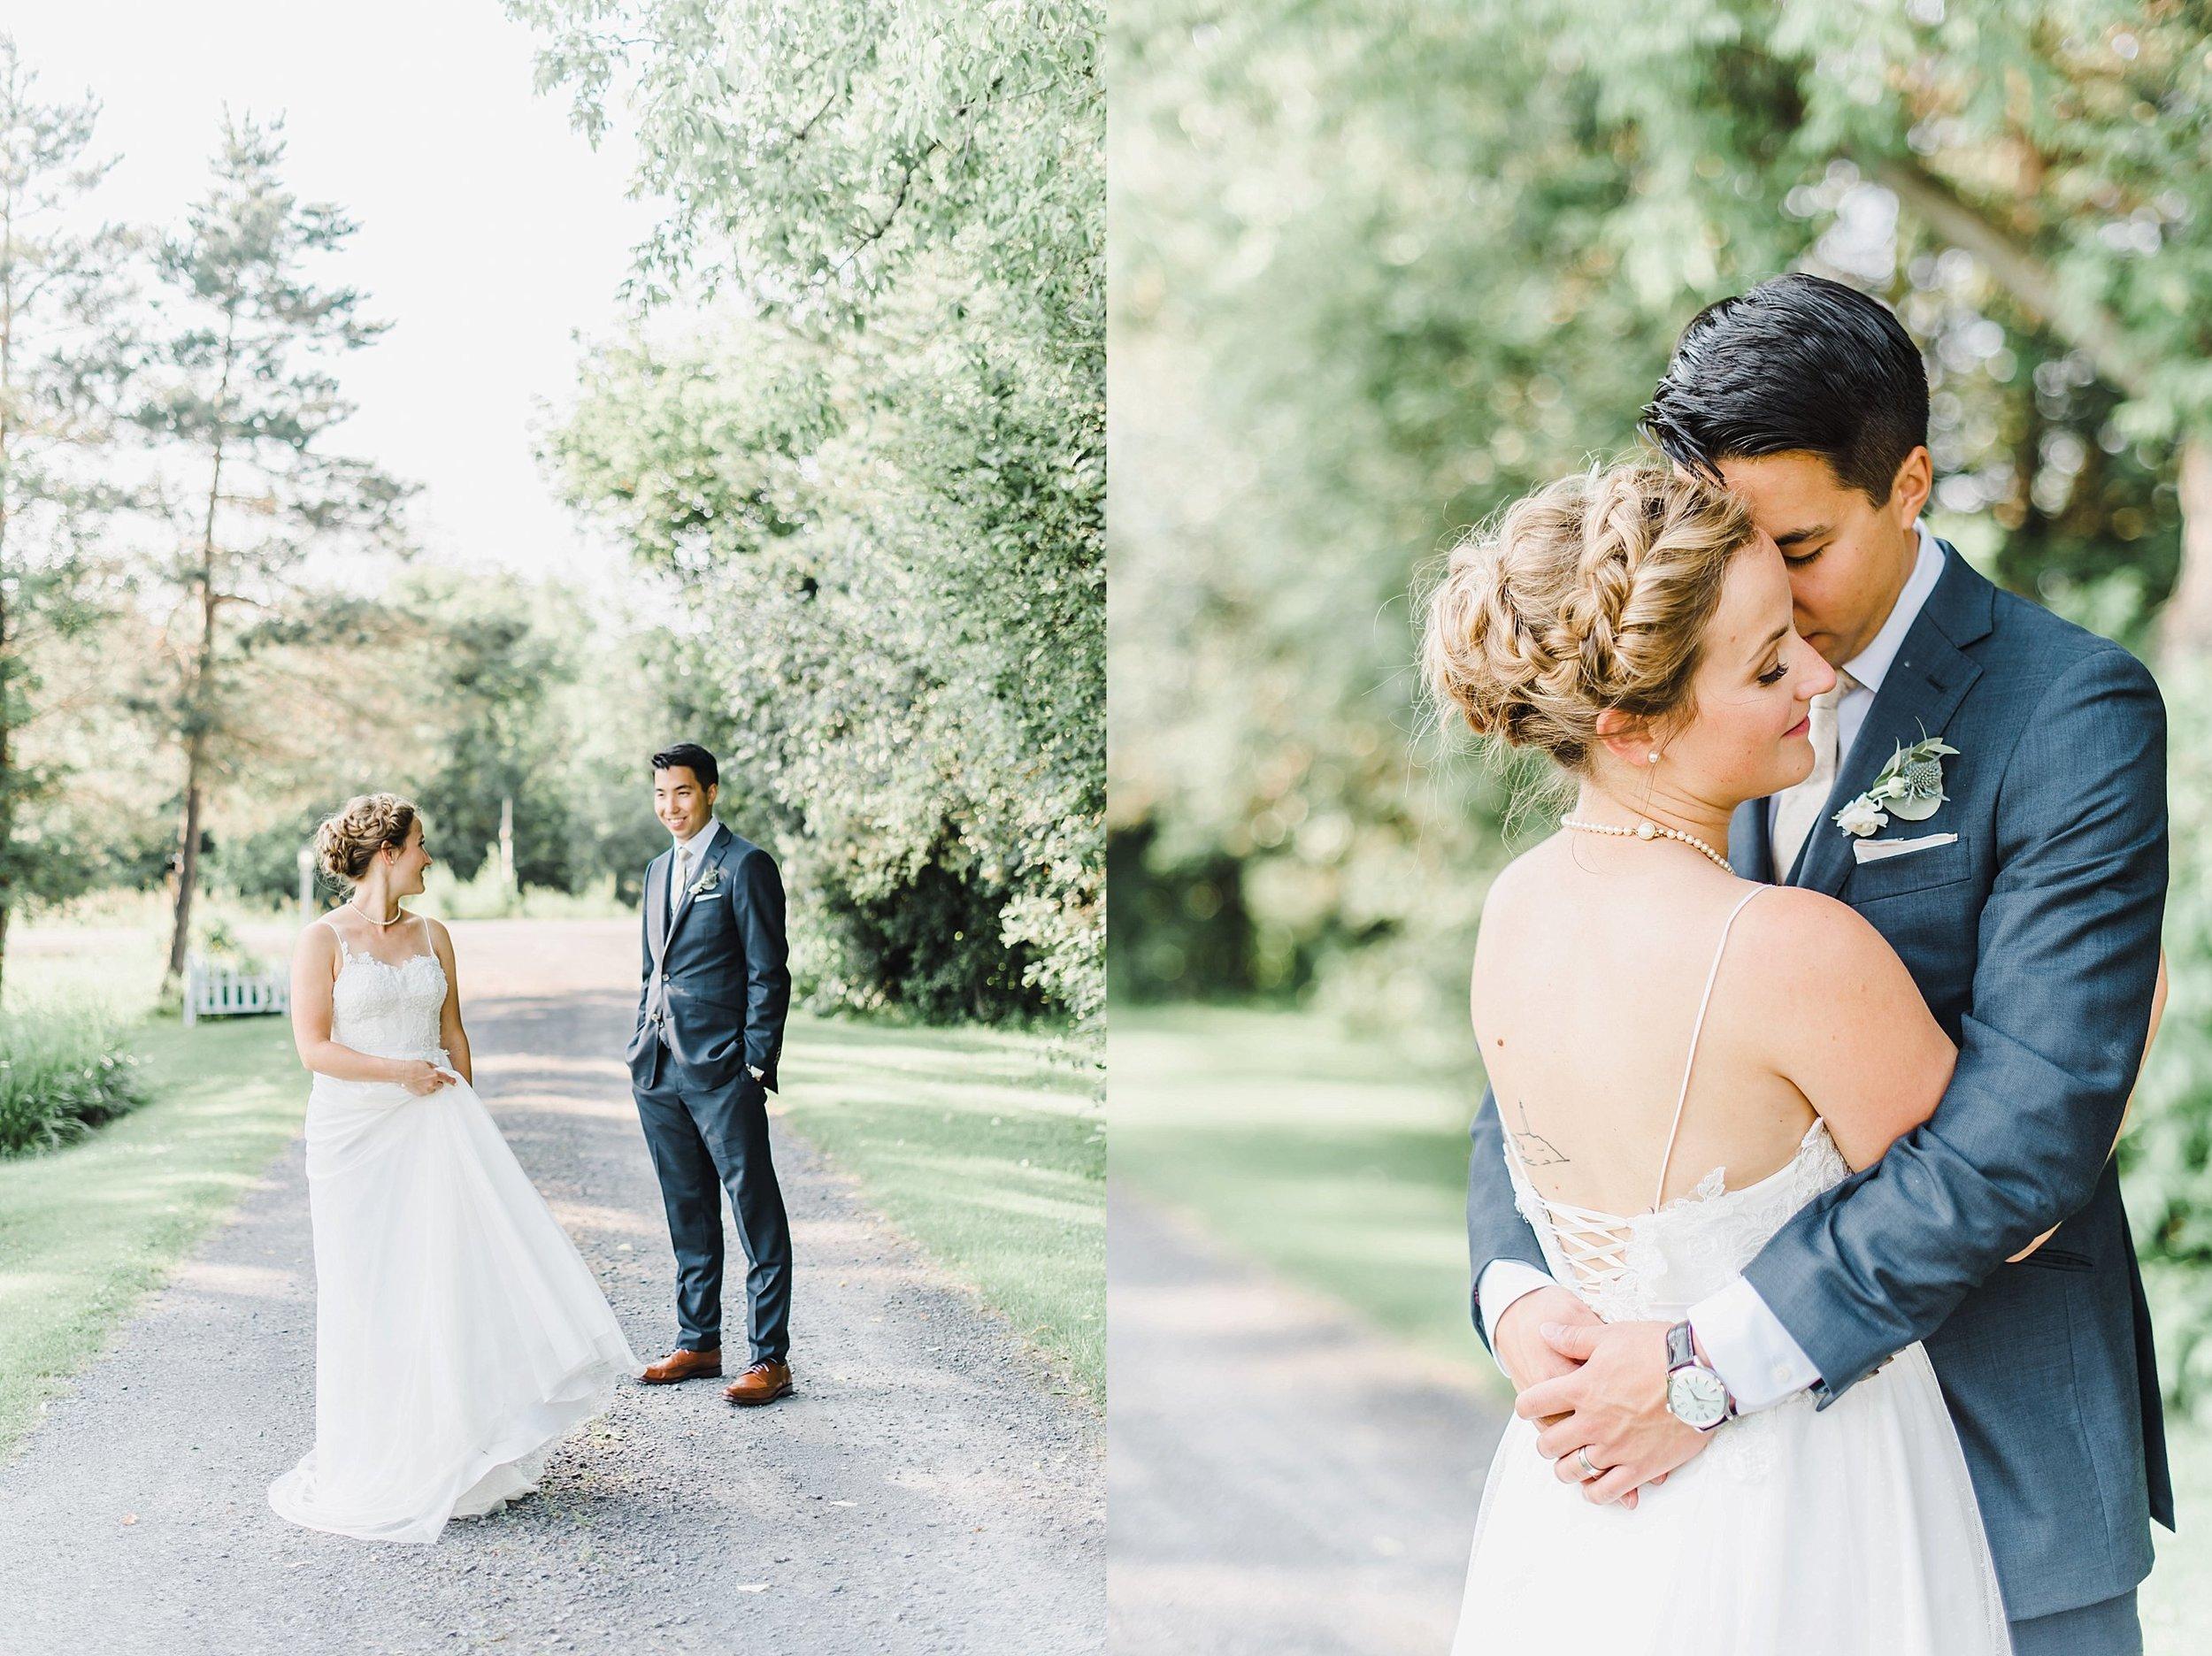 light airy indie fine art ottawa wedding photographer | Ali and Batoul Photography_0859.jpg